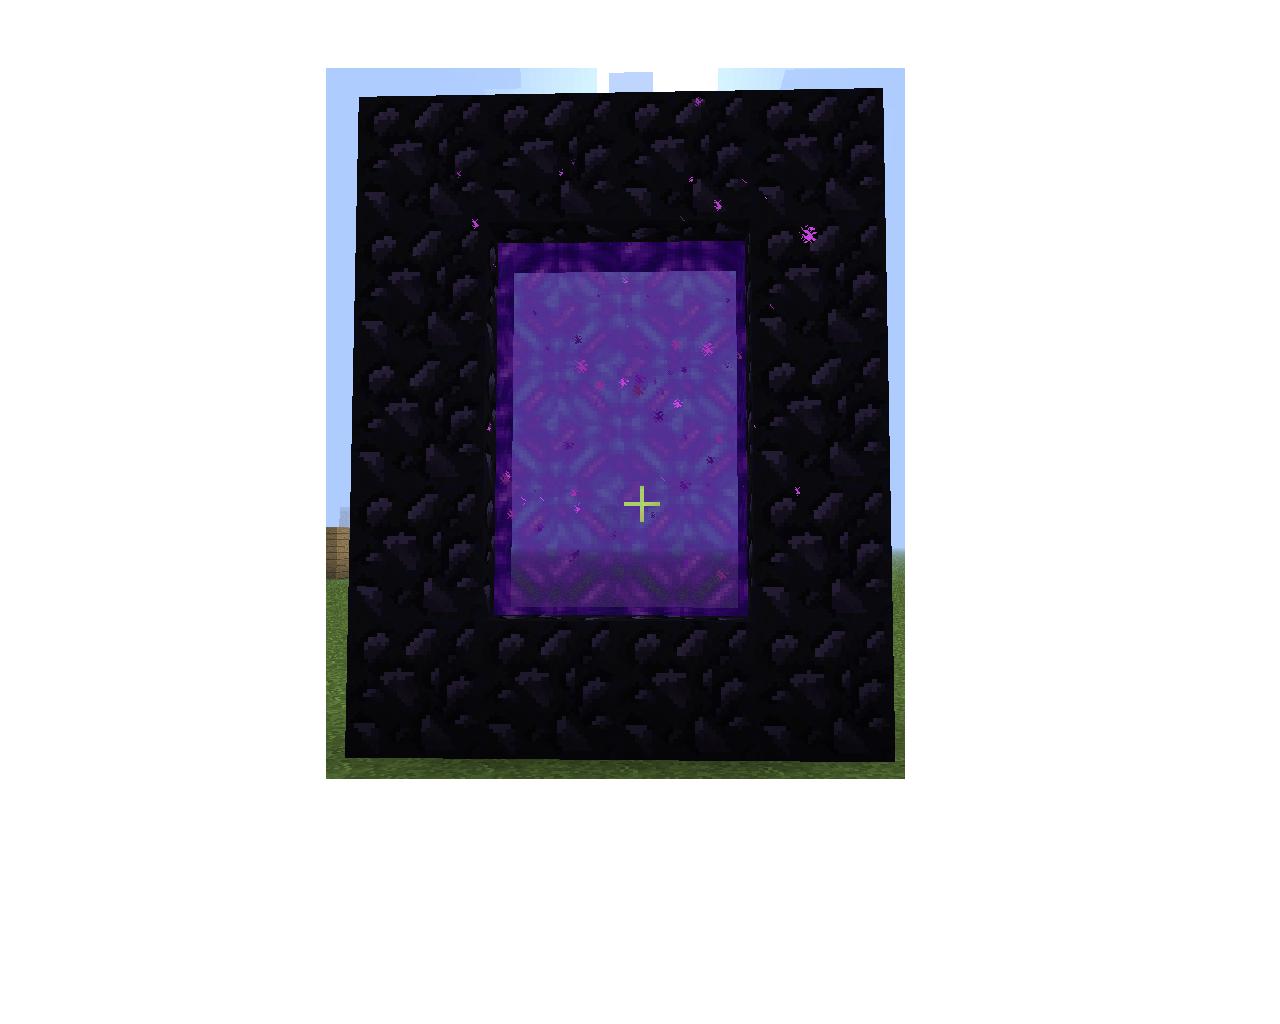 Portal do inferno minecraft - 3 6